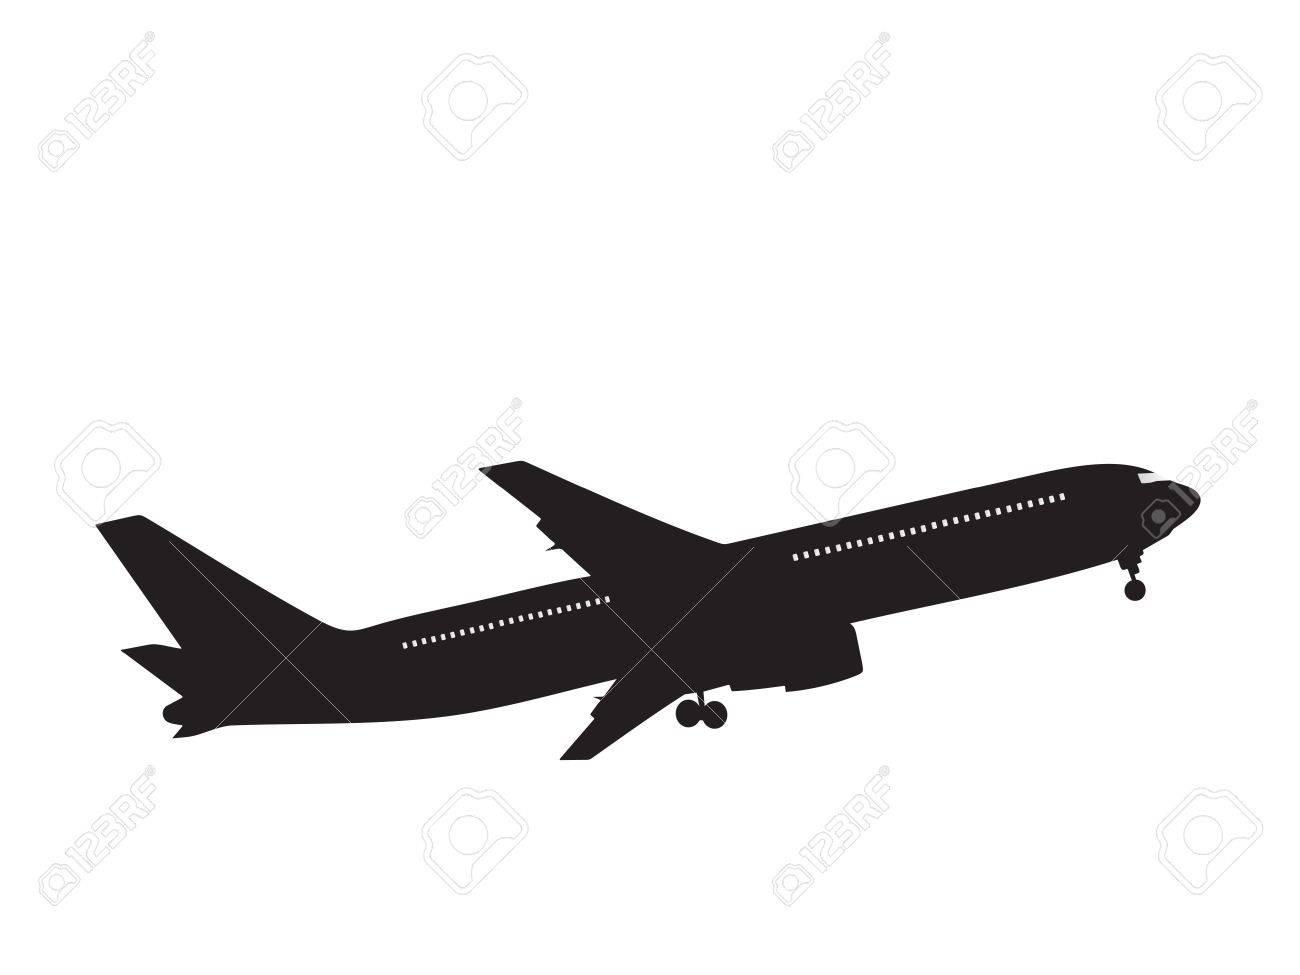 silhouette passenger airplane Stock Photo - 2073585